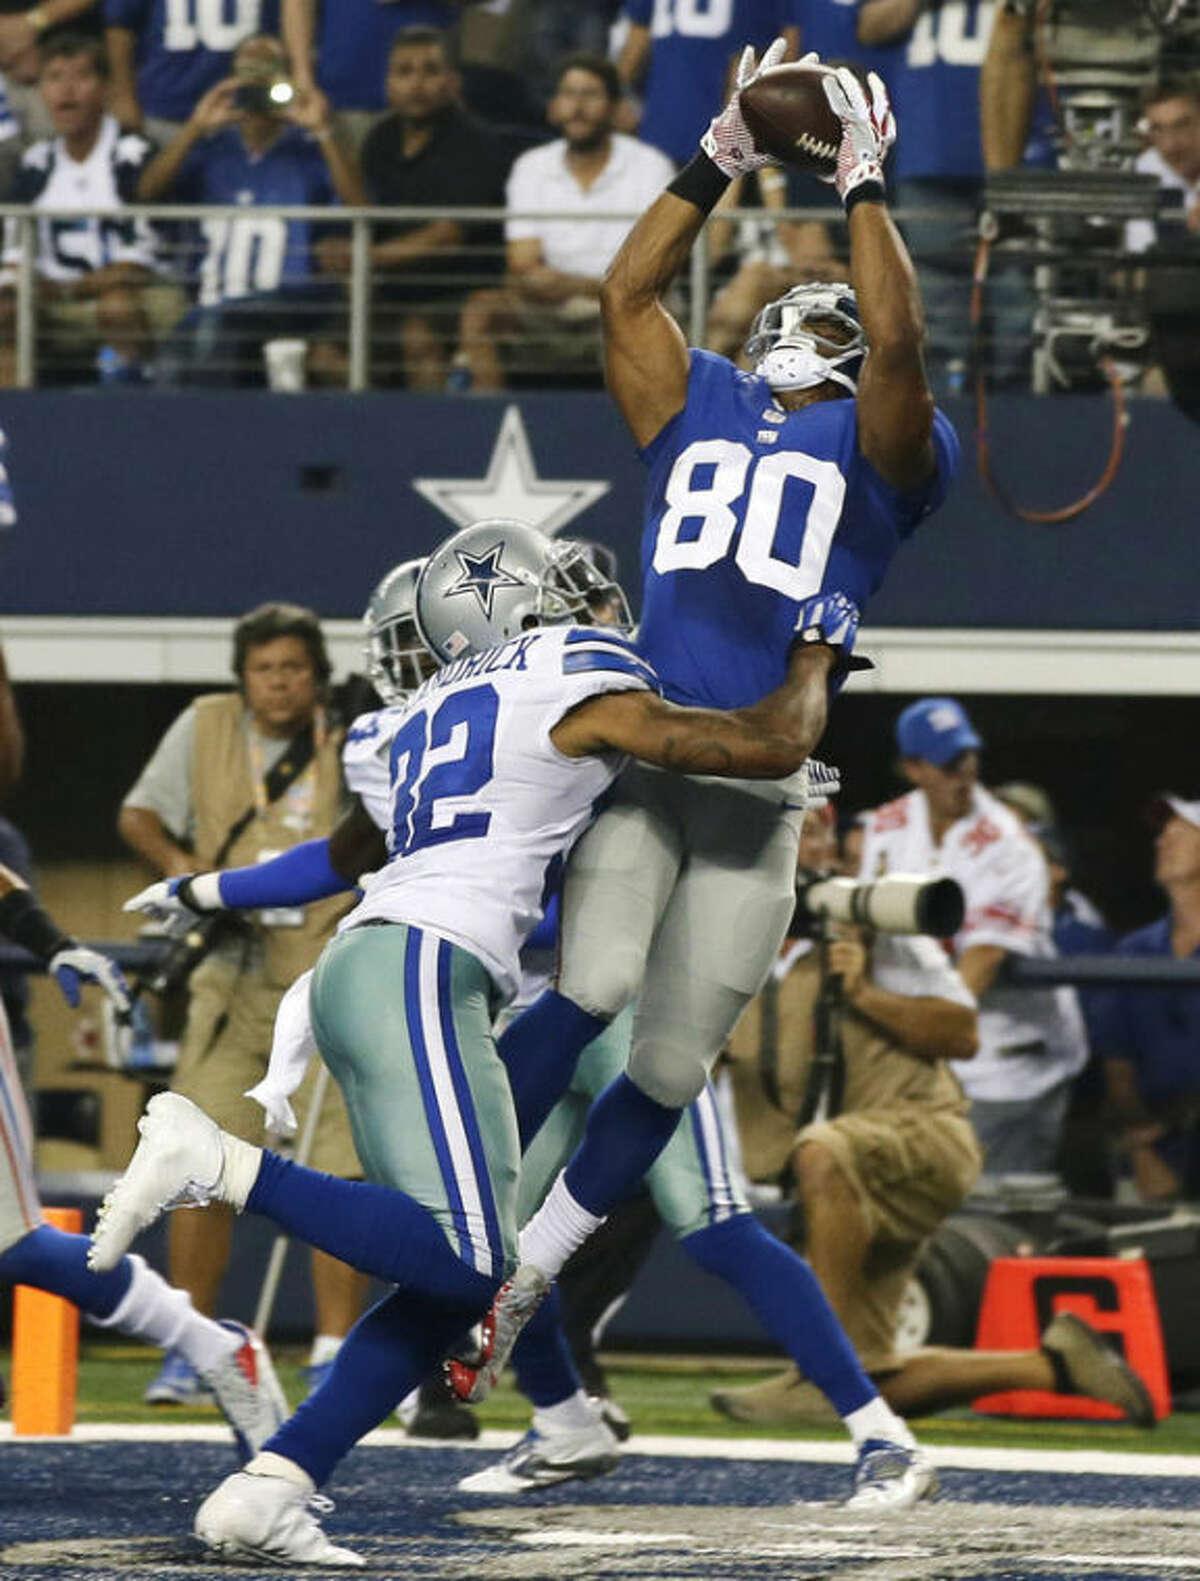 New York Giants wide receiver Victor Cruz (80) makes a 10-yard touchdown reception as Dallas Cowboys cornerback Orlando Scandrick (32) defends during the second half of an NFL football game, Sunday, Sept. 8, 2013, in Arlington, Texas. (AP Photo/Tony Gutierrez)